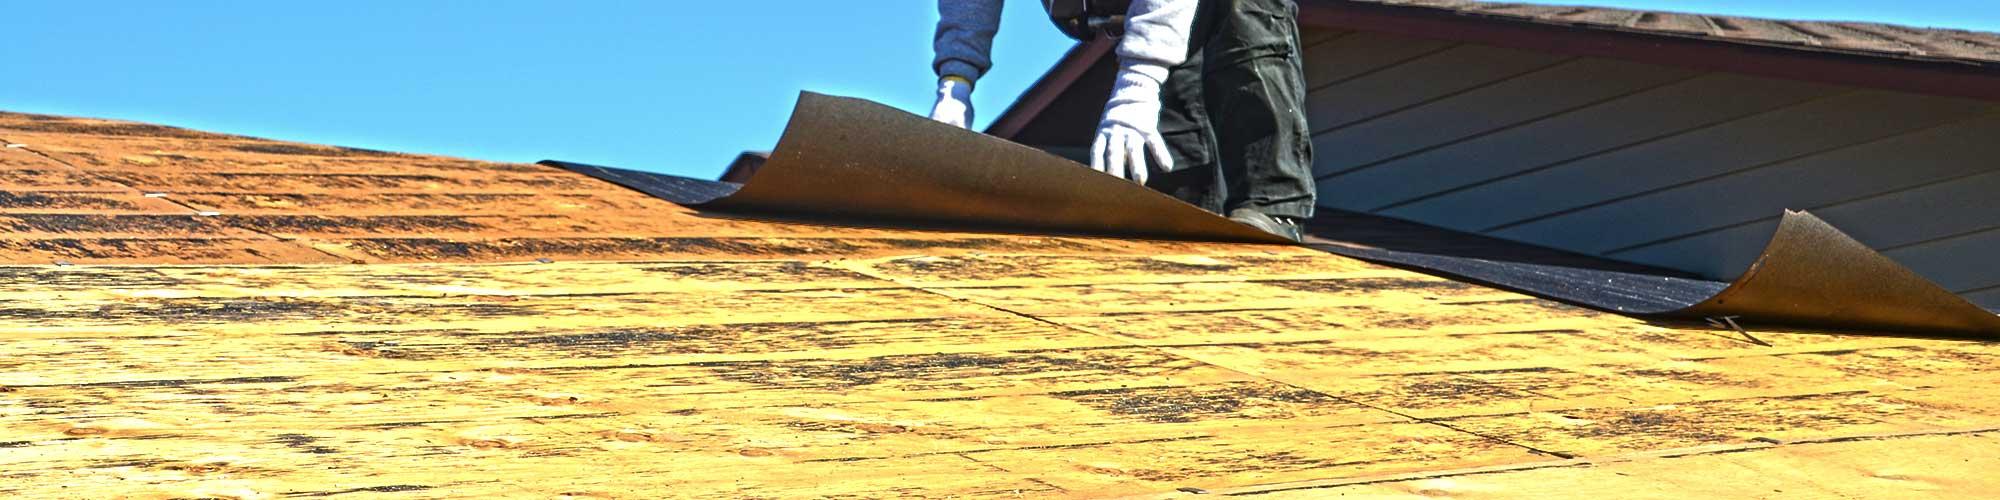 Elite Roof Repair in Calgary